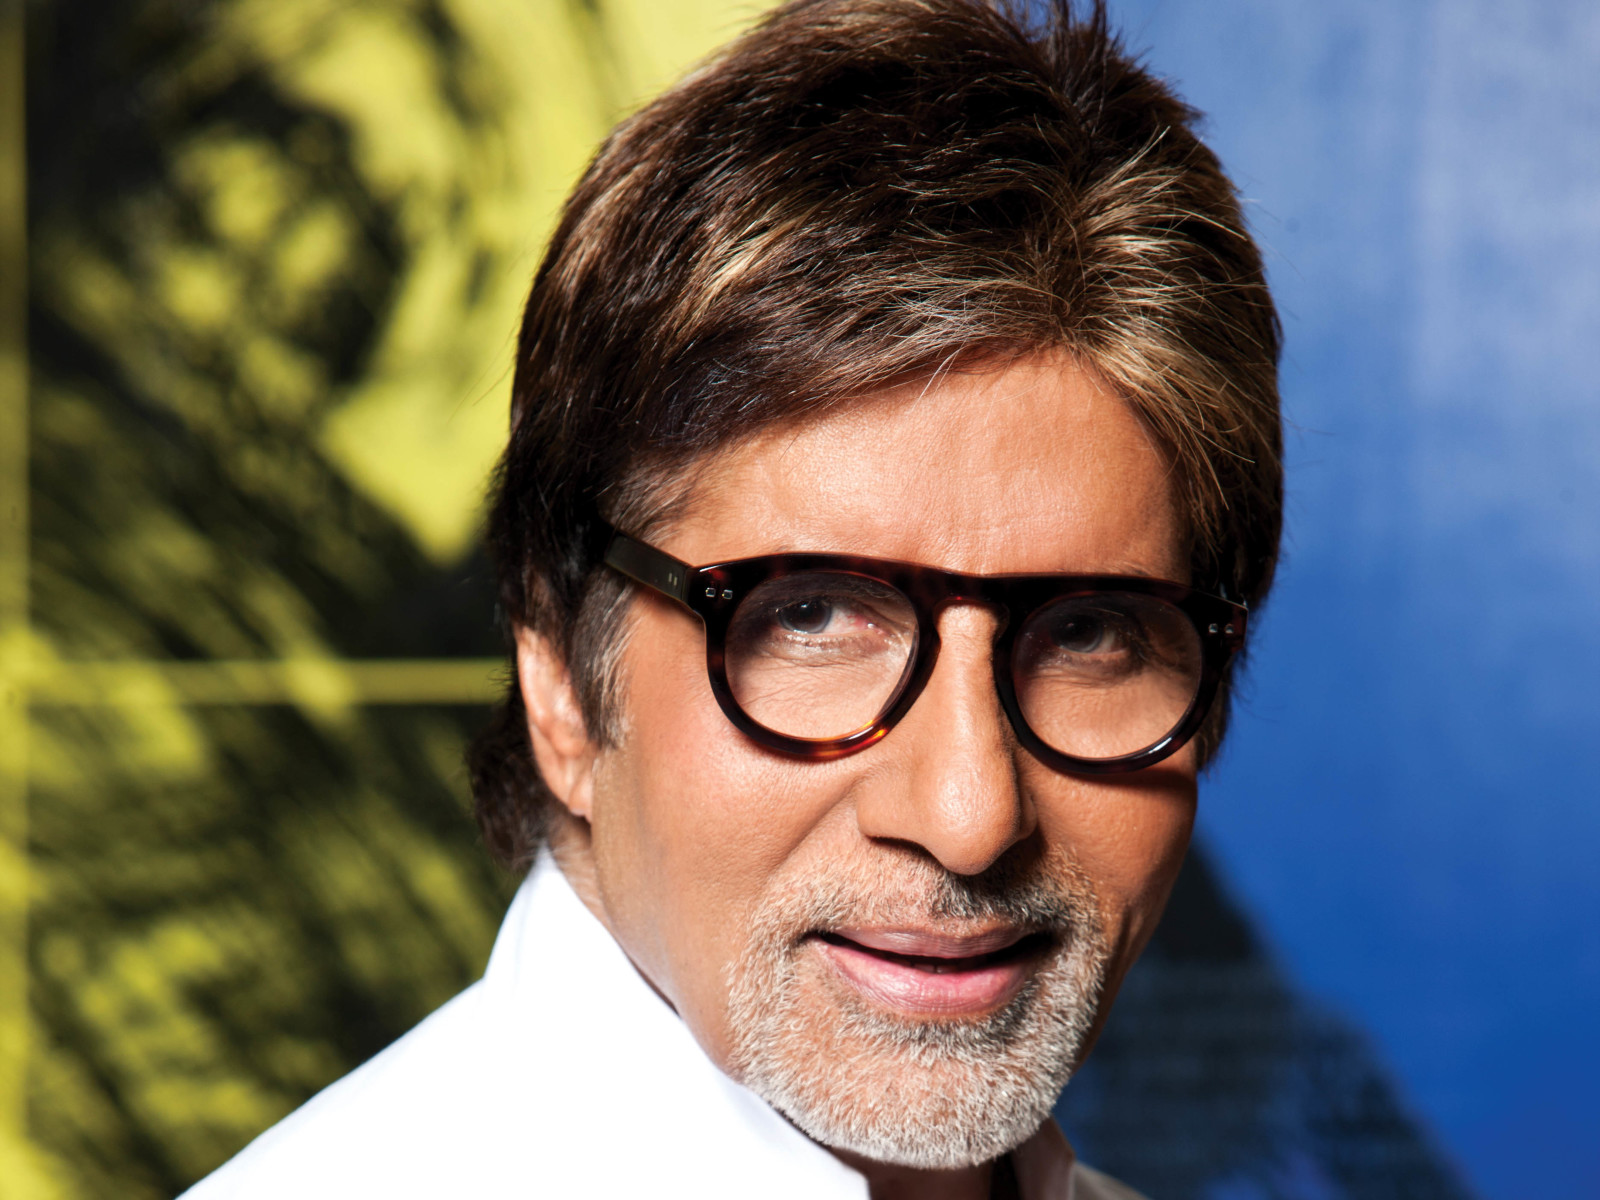 Hd Wallpaper Amitabh Bachchan And Jackie Chan 1574192